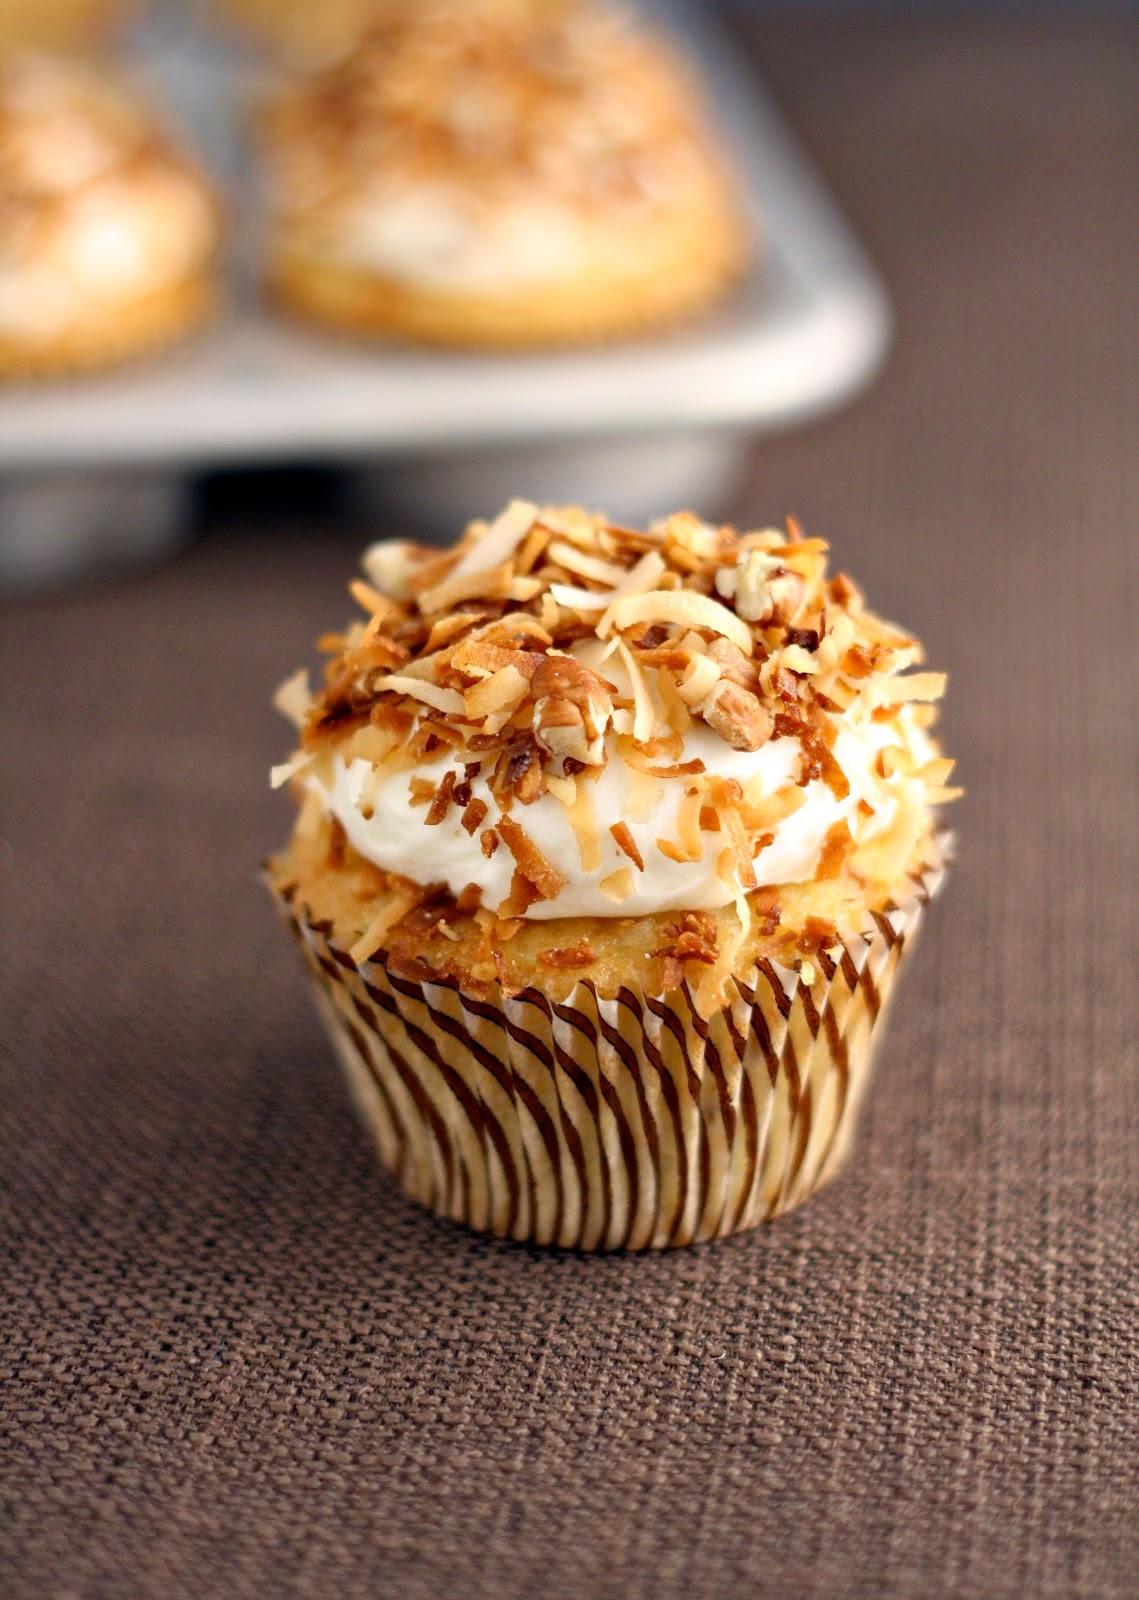 http://www.dinnerordessert.com/2012/06/italian-cream-cupcakes.html